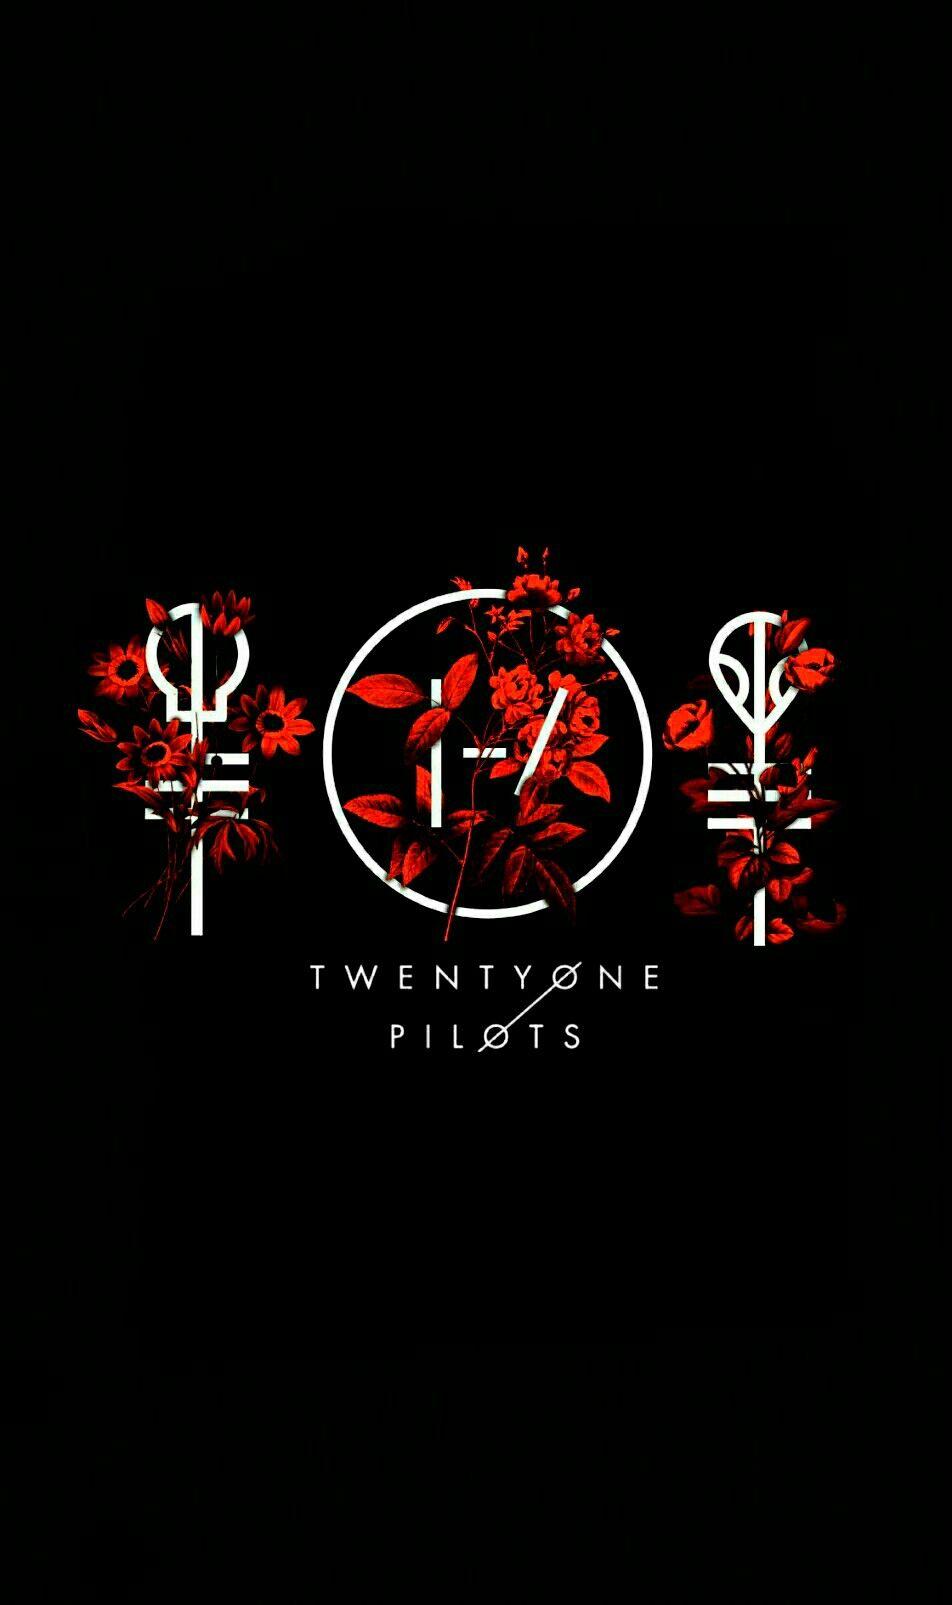 Twenty one pilots wallpaper ladyspookyjim Twenty one